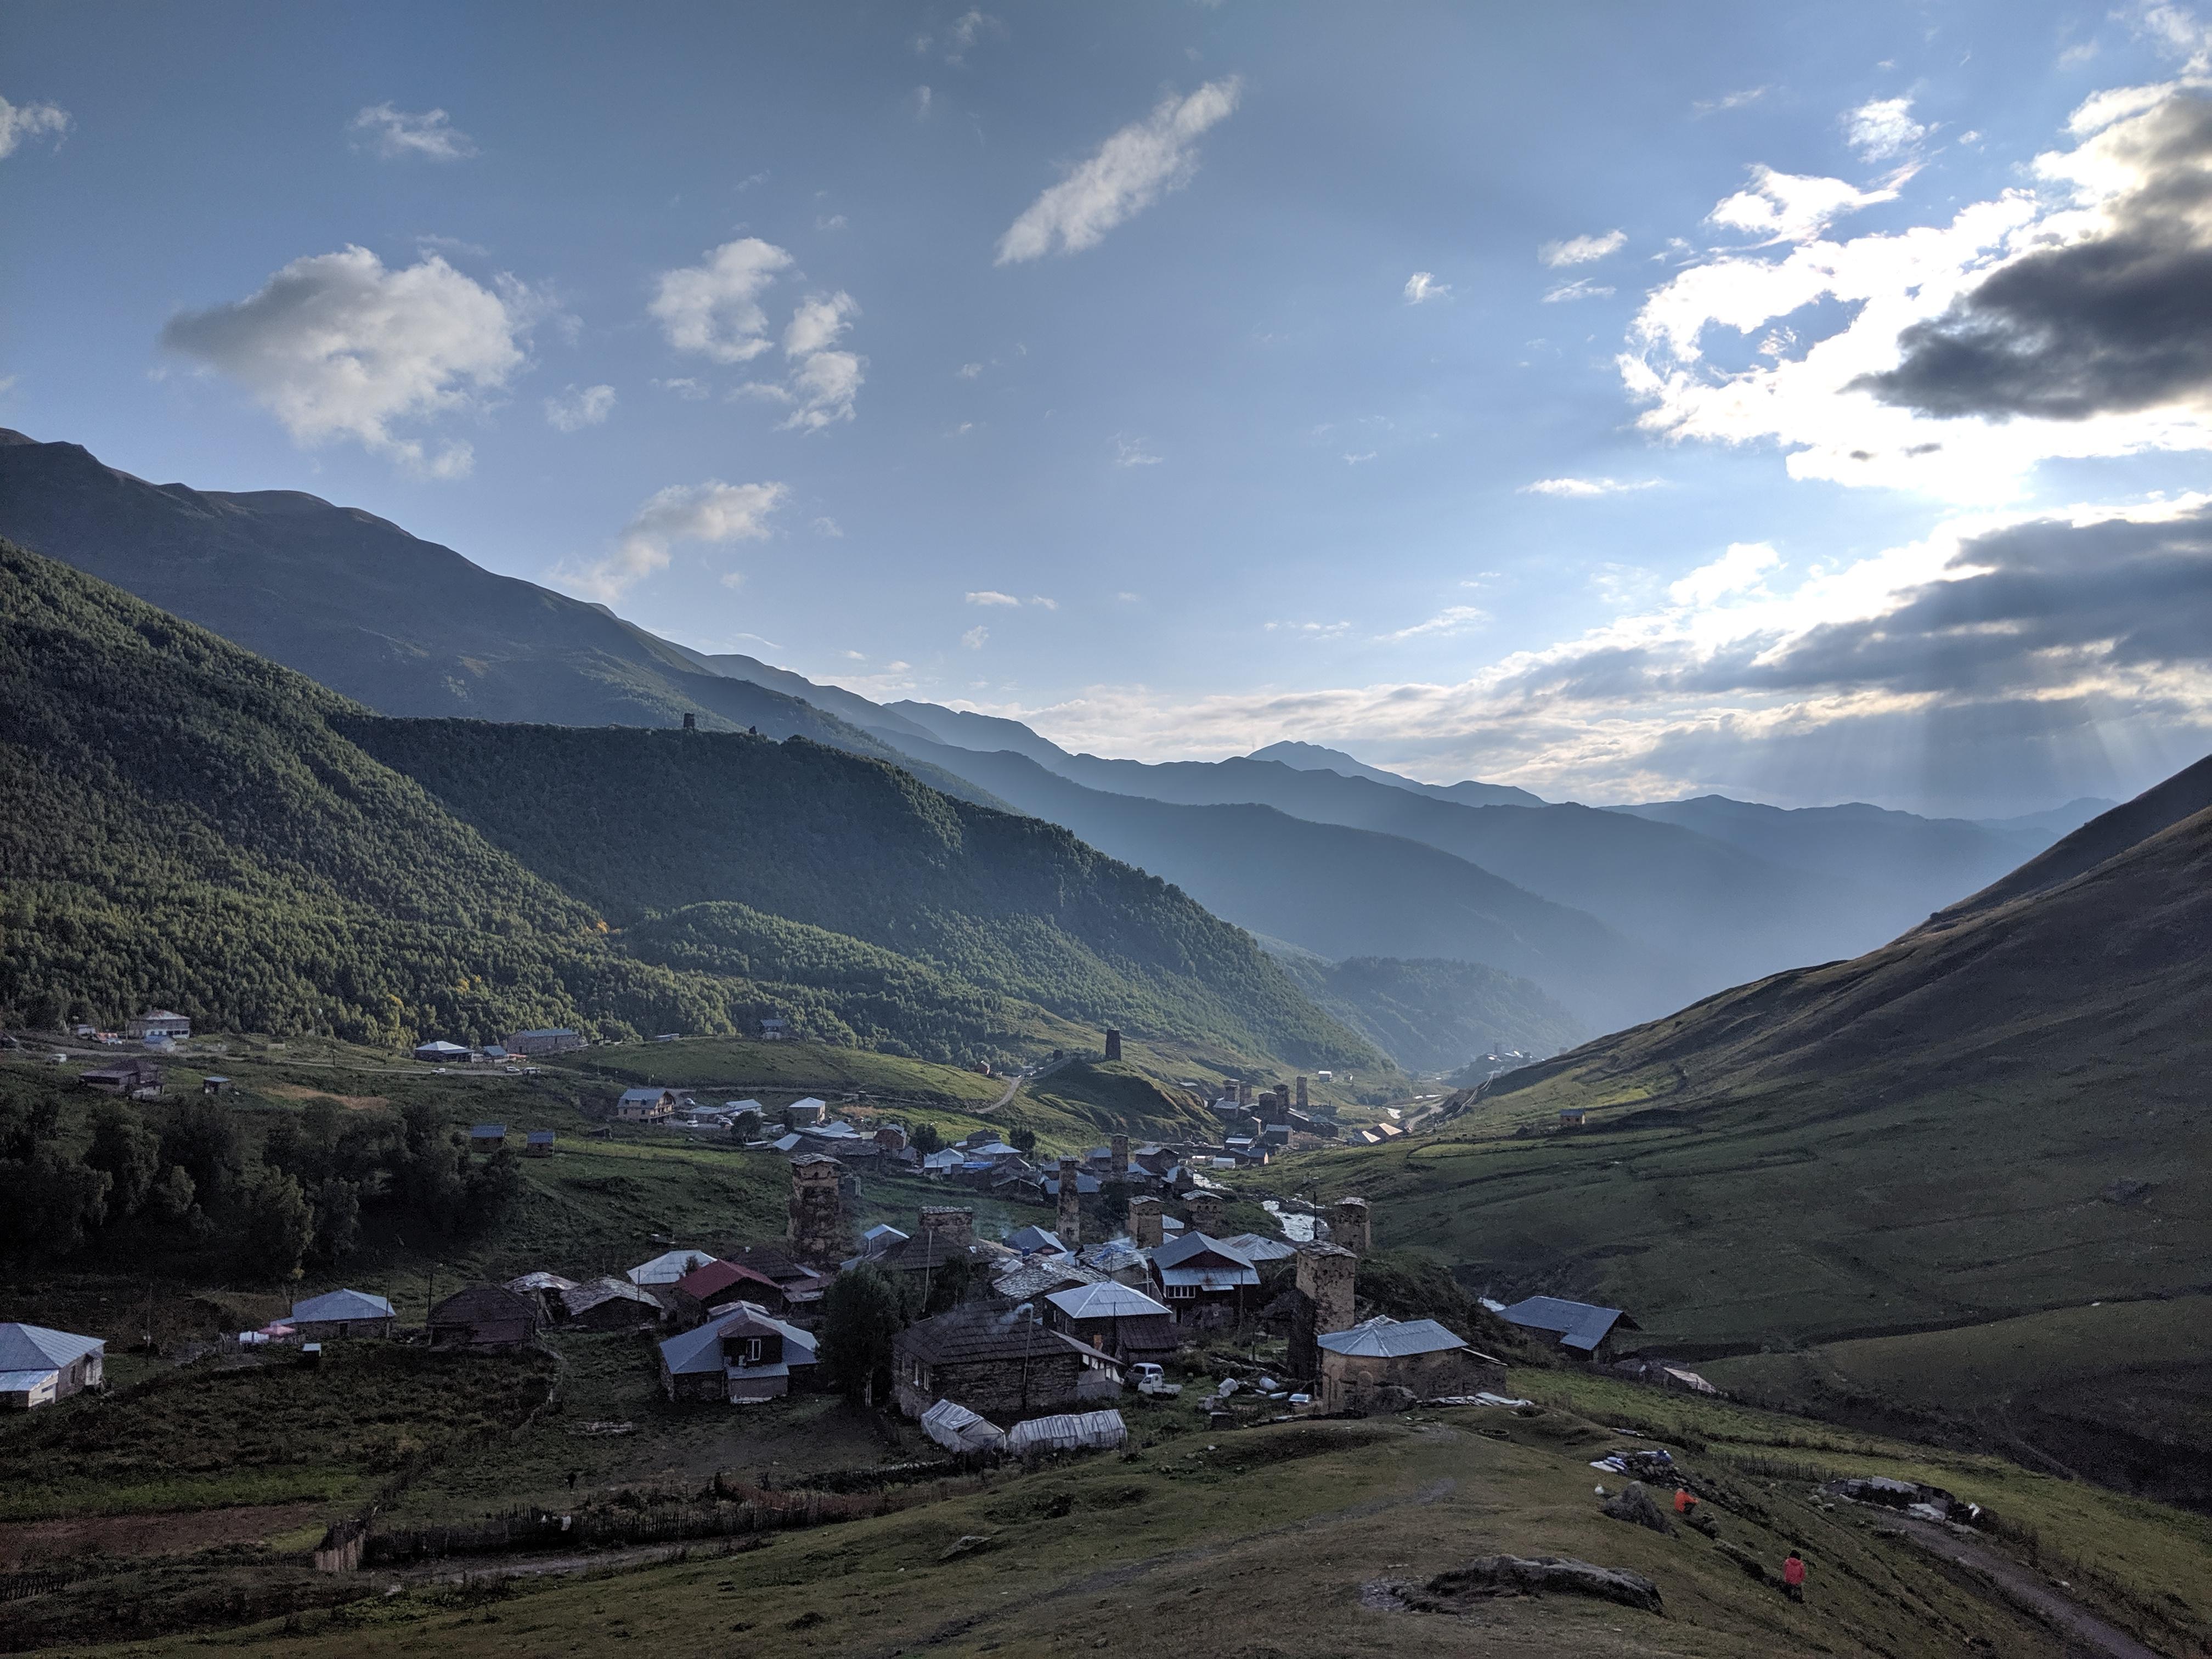 Ushguli Europe's Highest Permanent Settlement